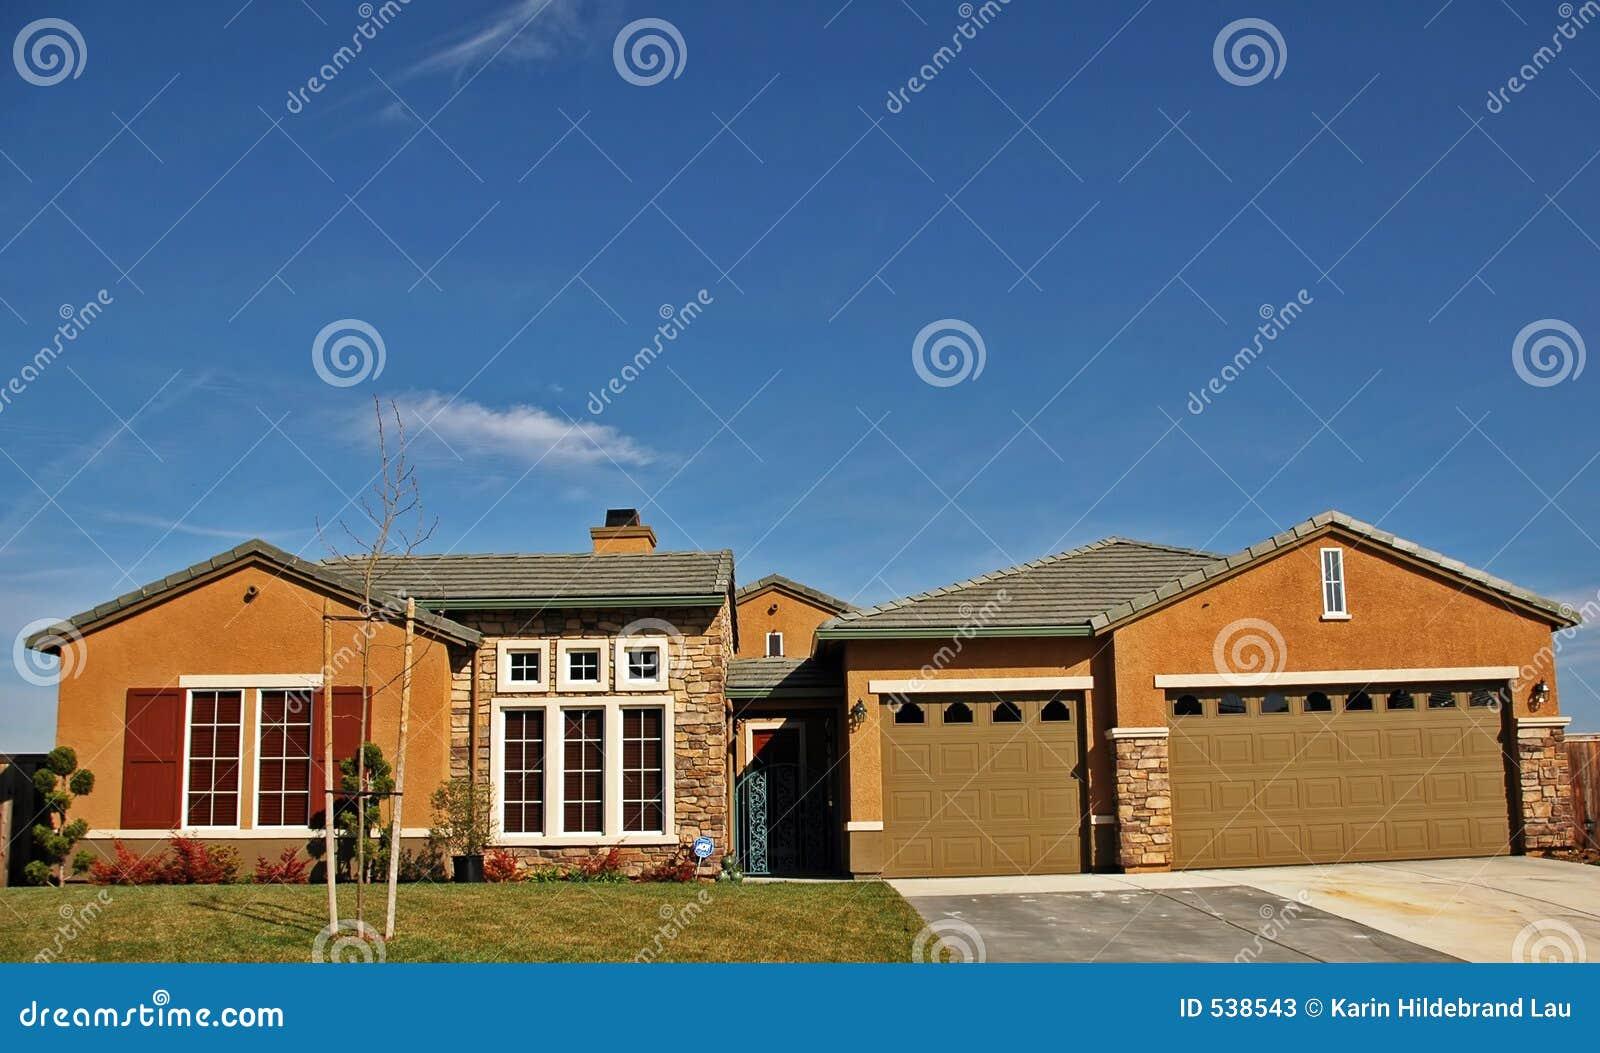 Download 家庭大 库存图片. 图片 包括有 富有, 庄园, 建筑师, 汽车, 生活方式, 房子, 拱道, 前面, 消耗大 - 538543